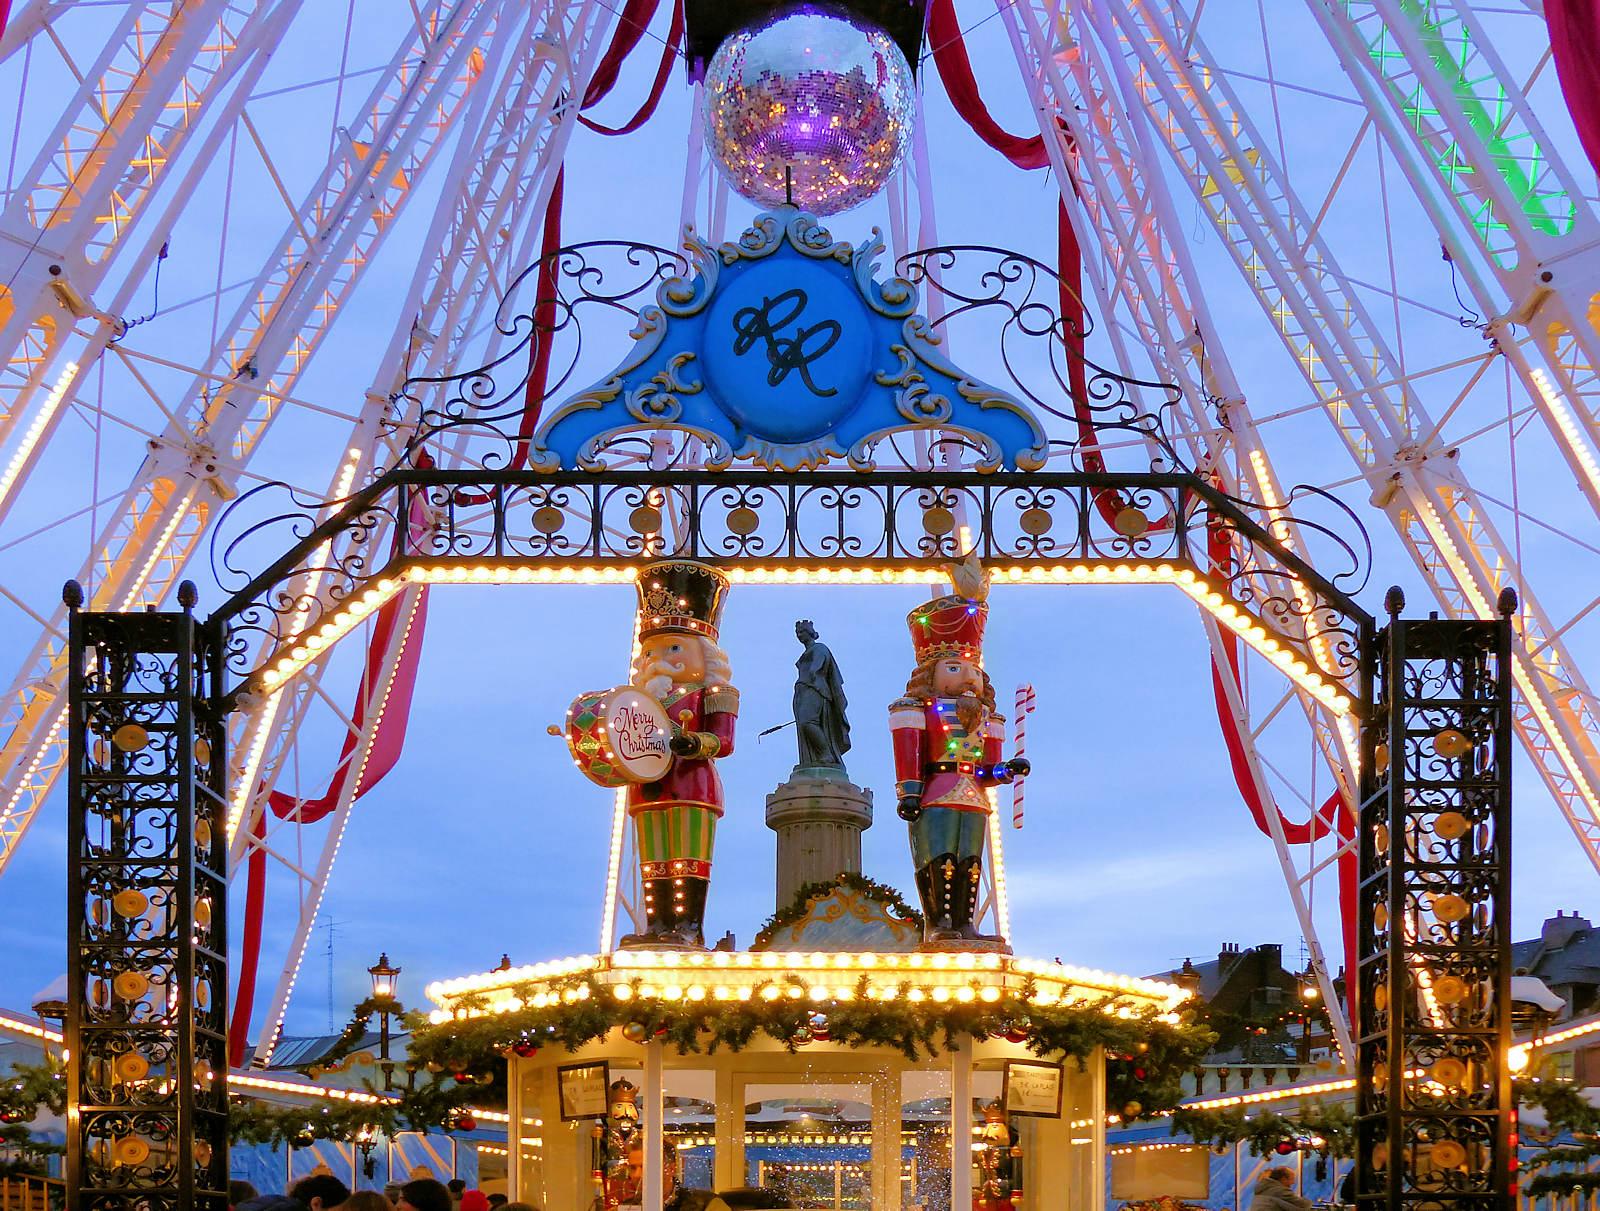 Grande Roue, Grand Place Lille 2019